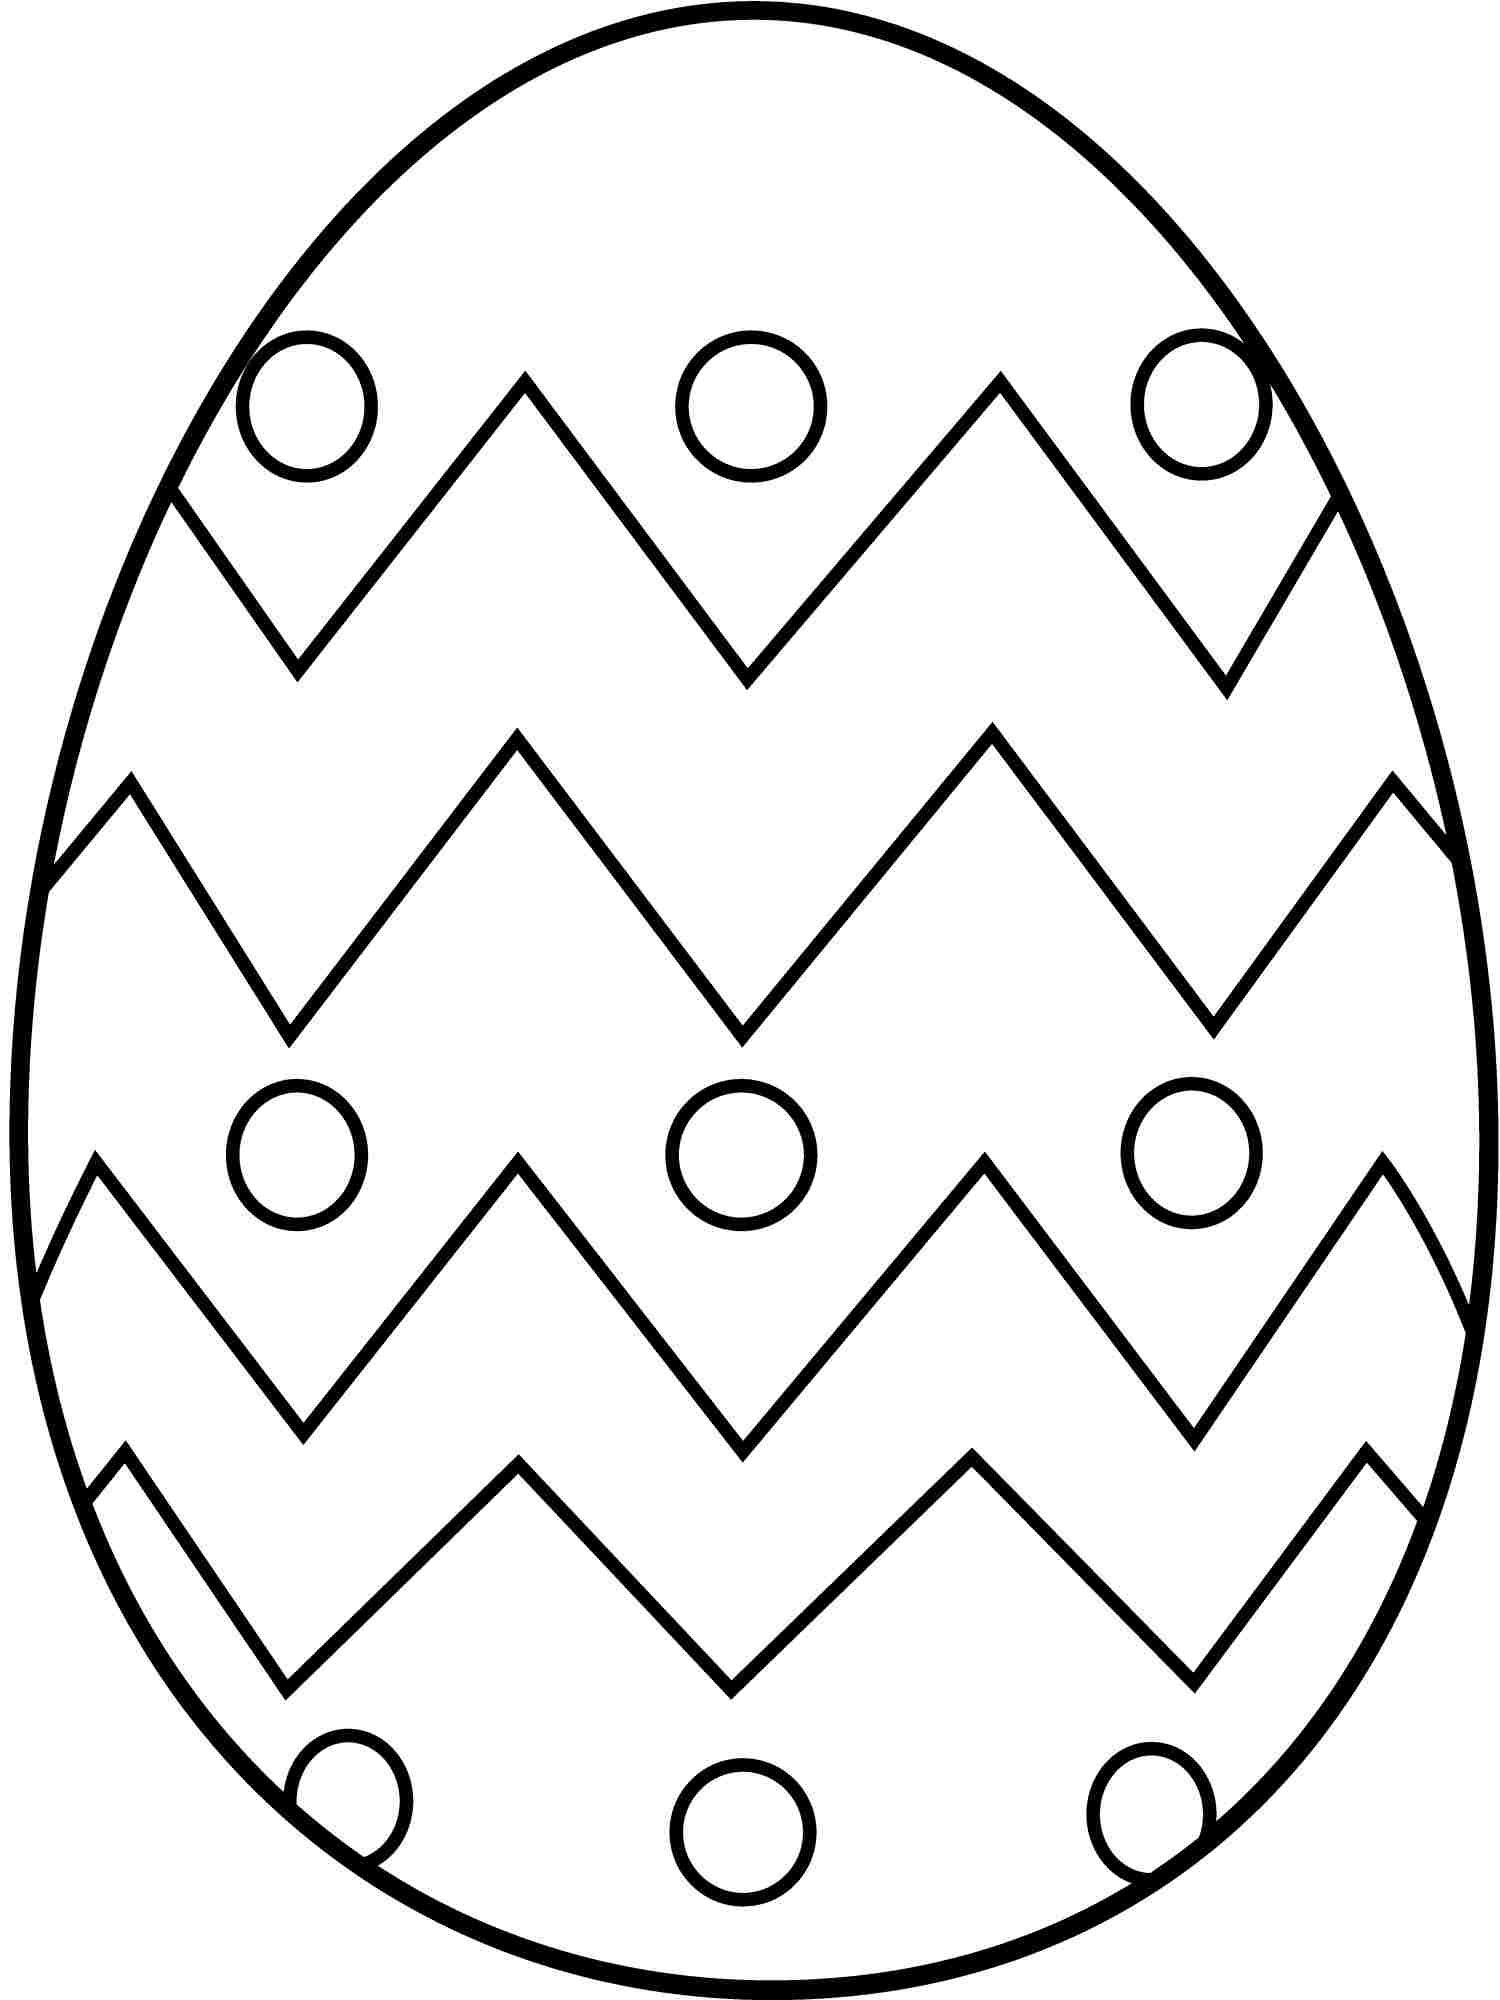 Printable Easter Coloring Sheets Printable Free Design | Julie - Free Printable Easter Colouring Sheets